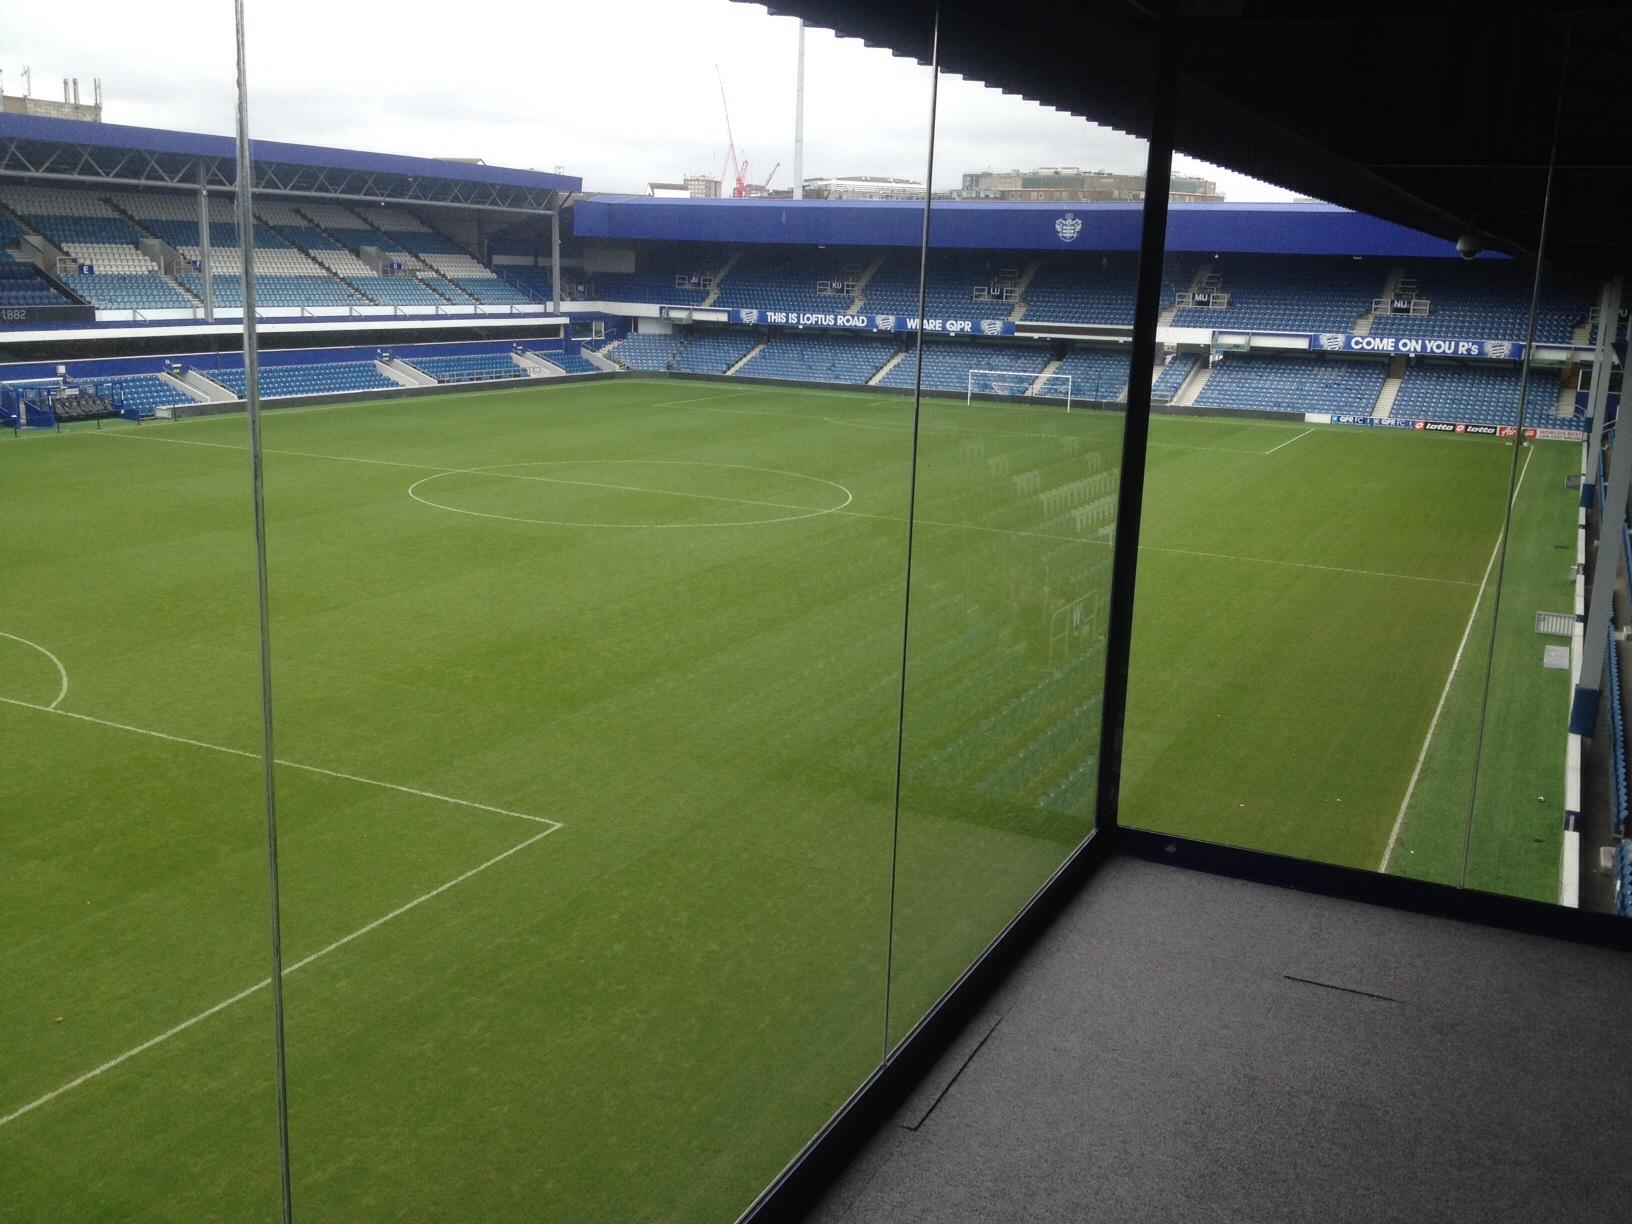 Sky Sports box view